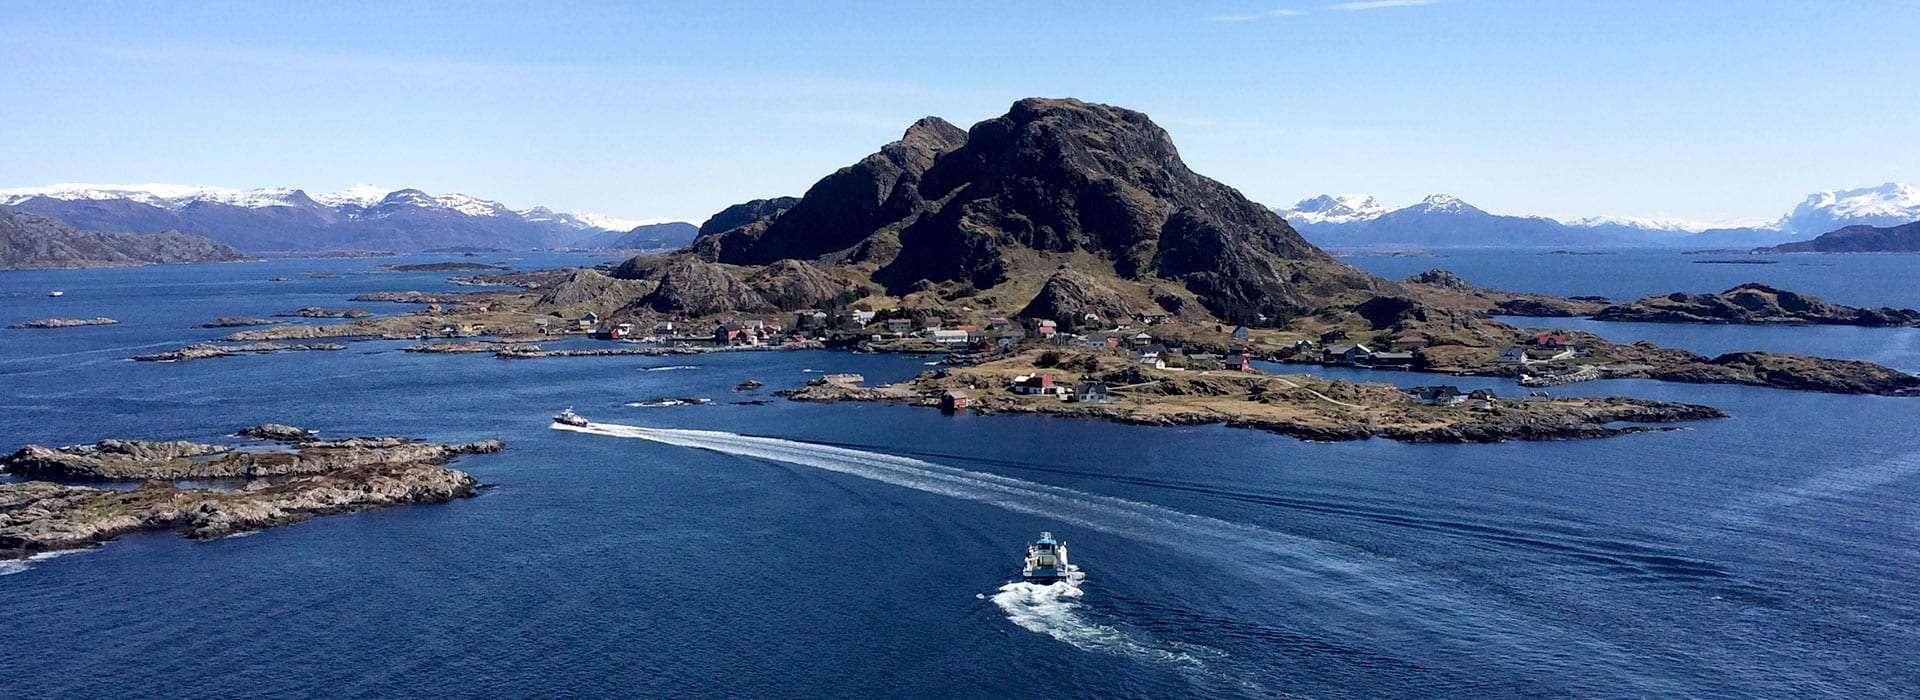 Båt køyrer mellom øyane. Foto.